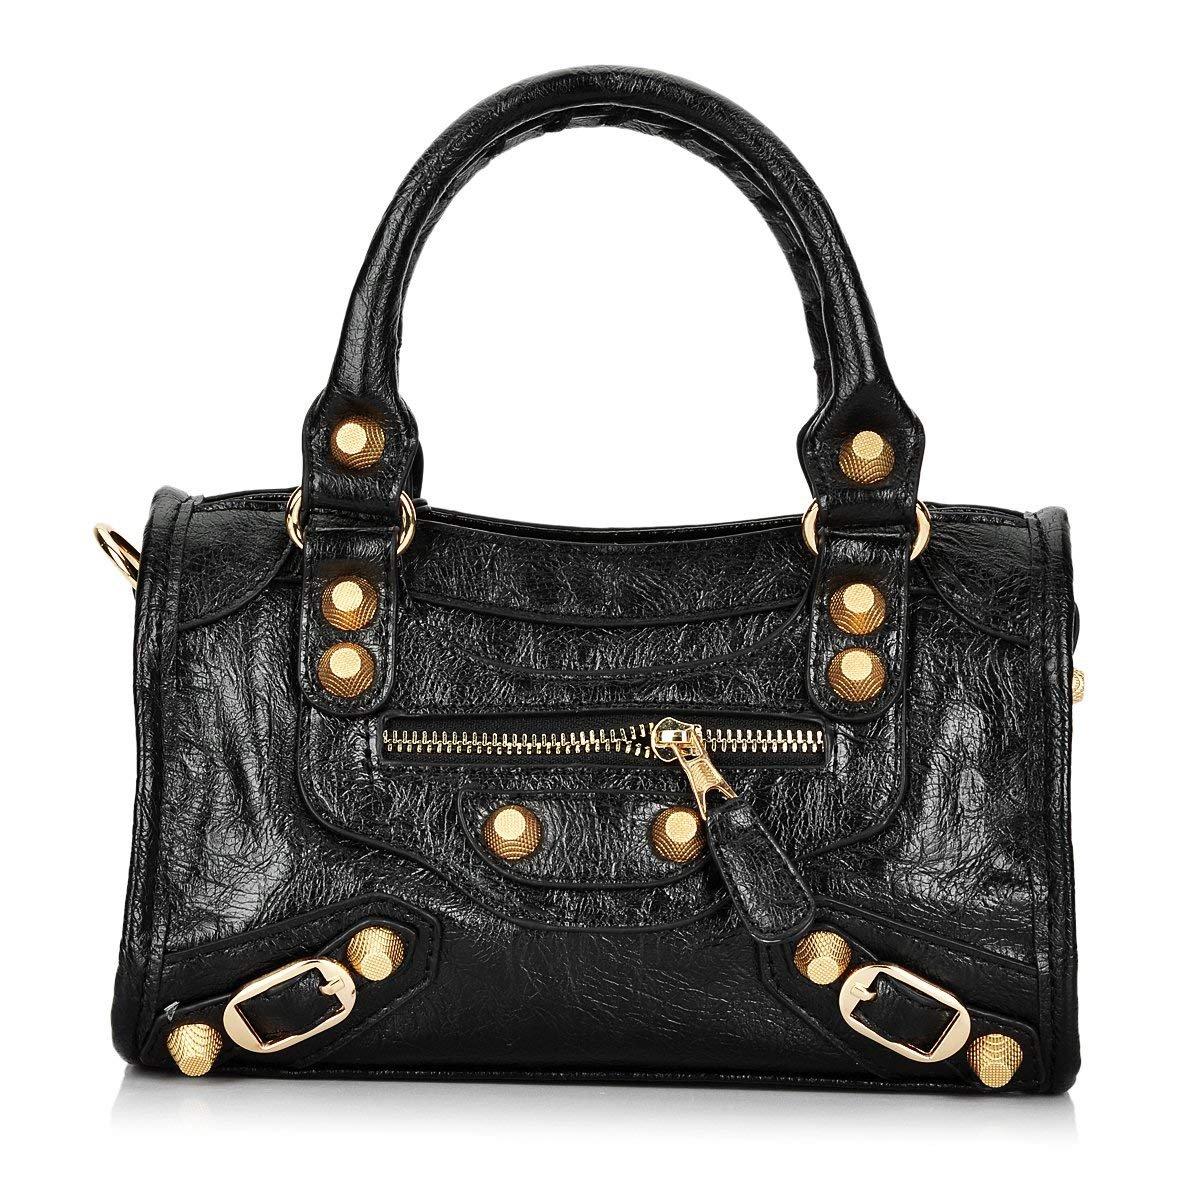 Gold-Tech Women Leather Big Gold Color Studed Motorcycle Bags 38cm Medium Size Shoulder Bag 2 Colors (24cm Black)